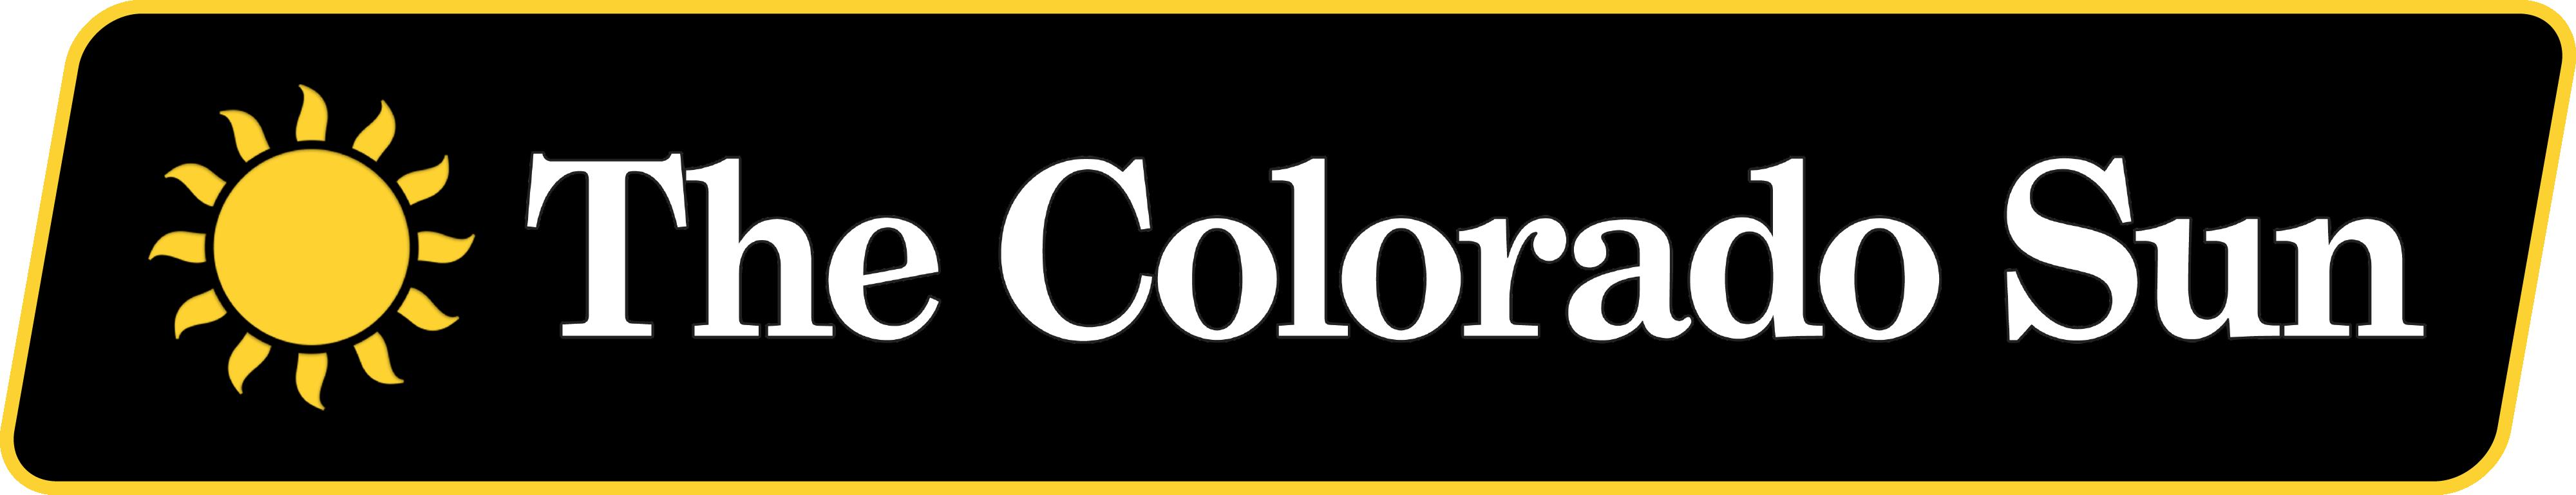 1 Loans 10 Million For A Nail Salon Colorado S Federal Coronavirus Loan Data Has Some Eye Popping Errors The Colorado Sun